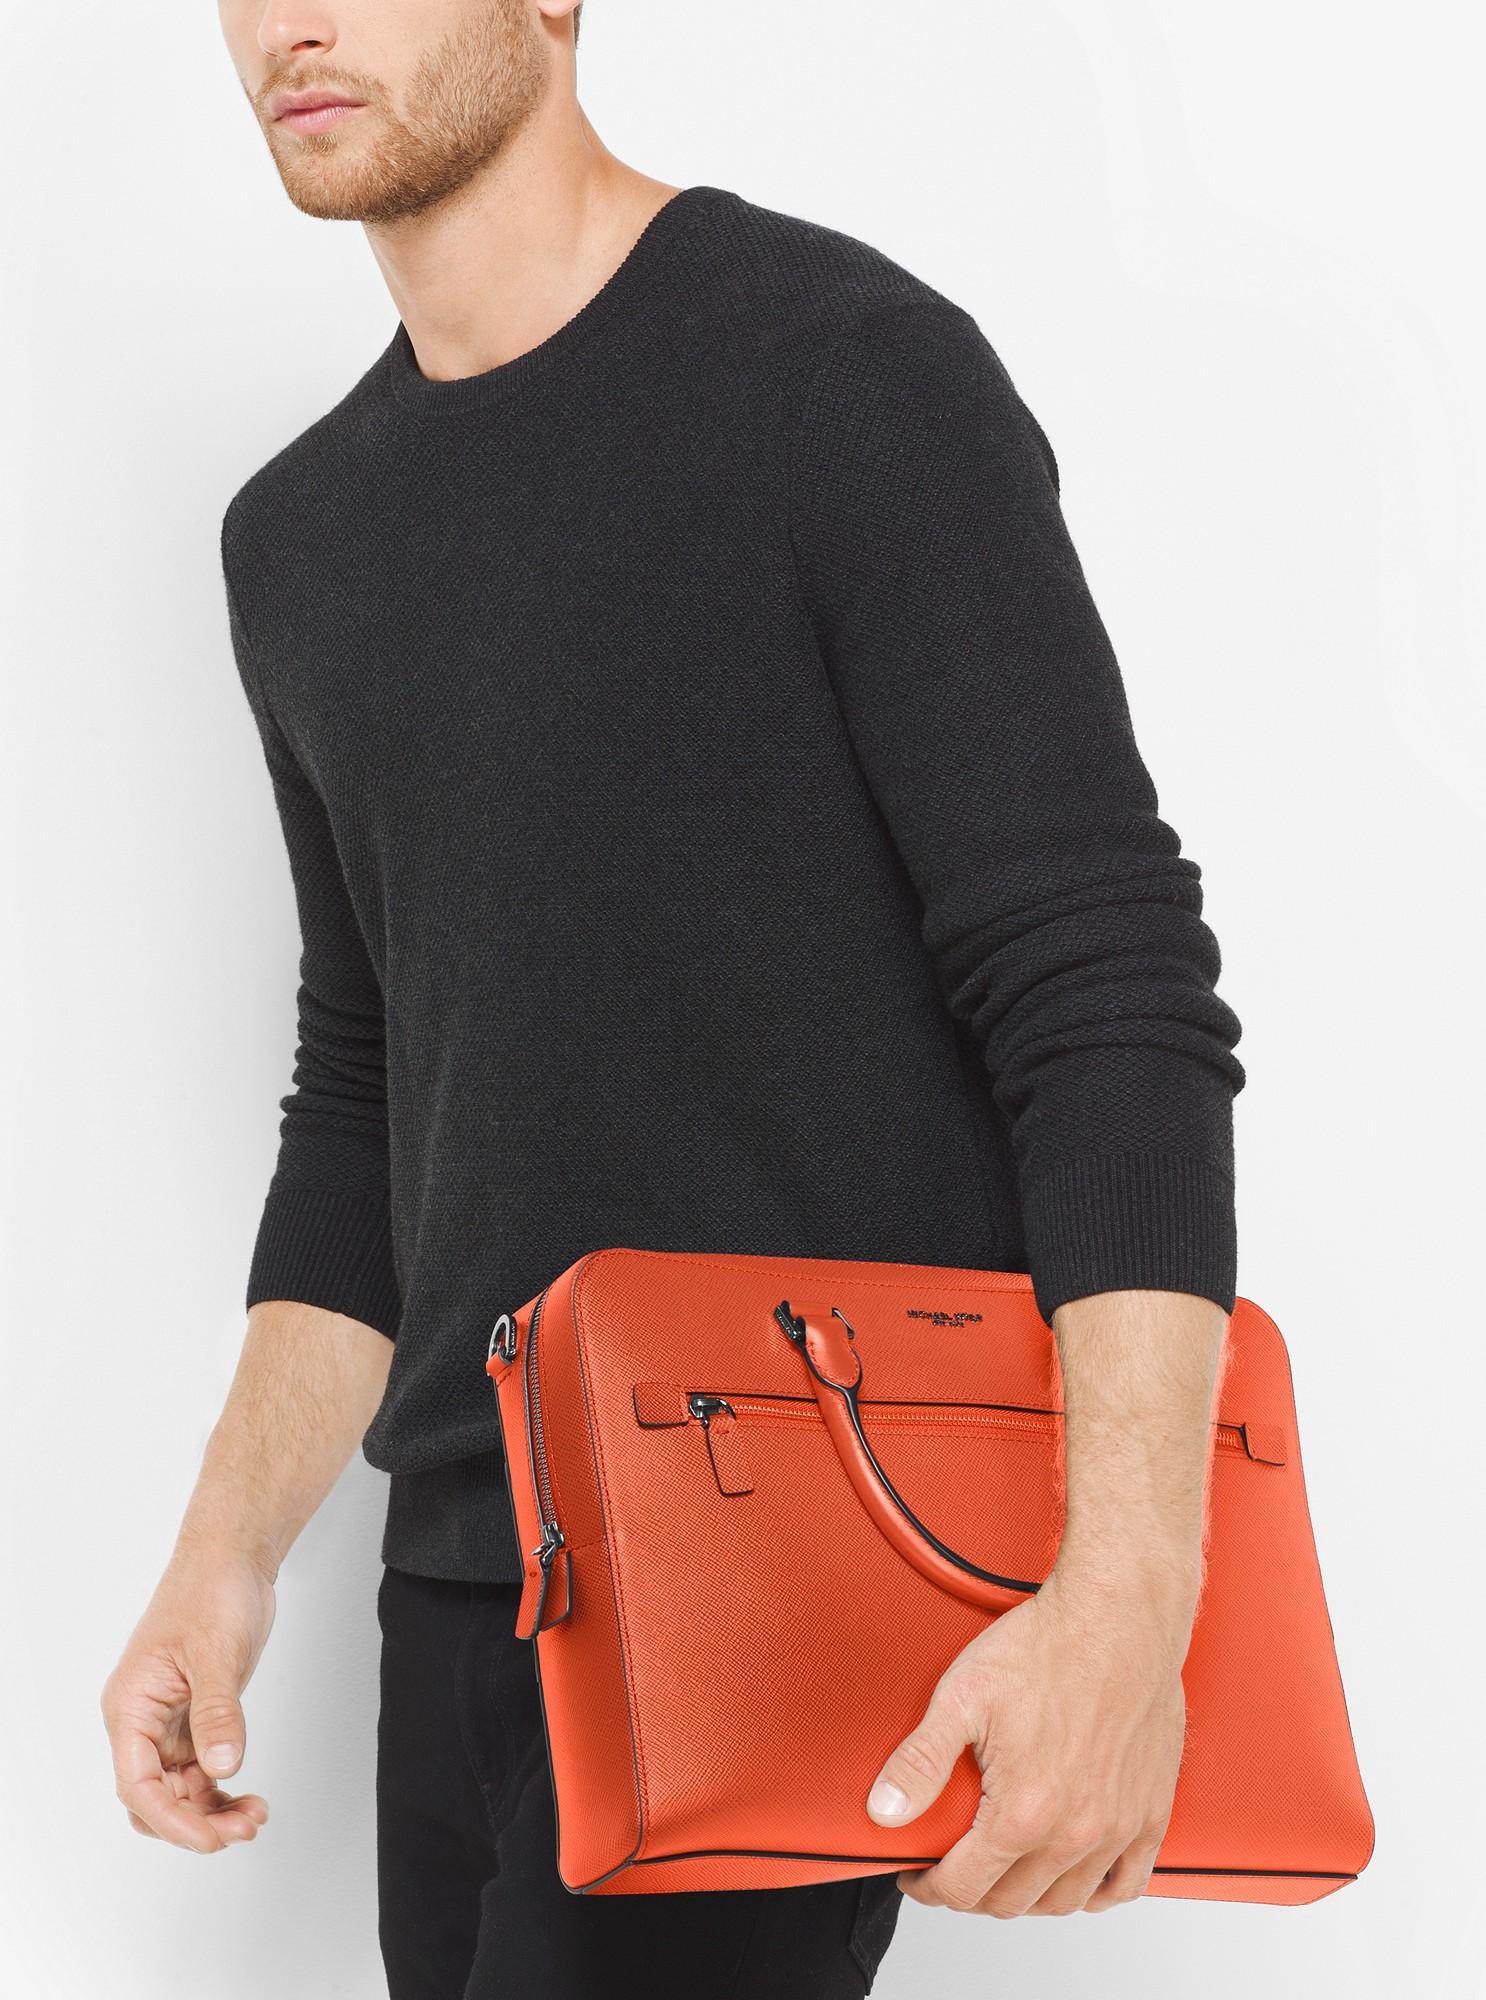 844b3f070b830 Michael Kors Harrison Medium Leather Briefcase - Brightorange